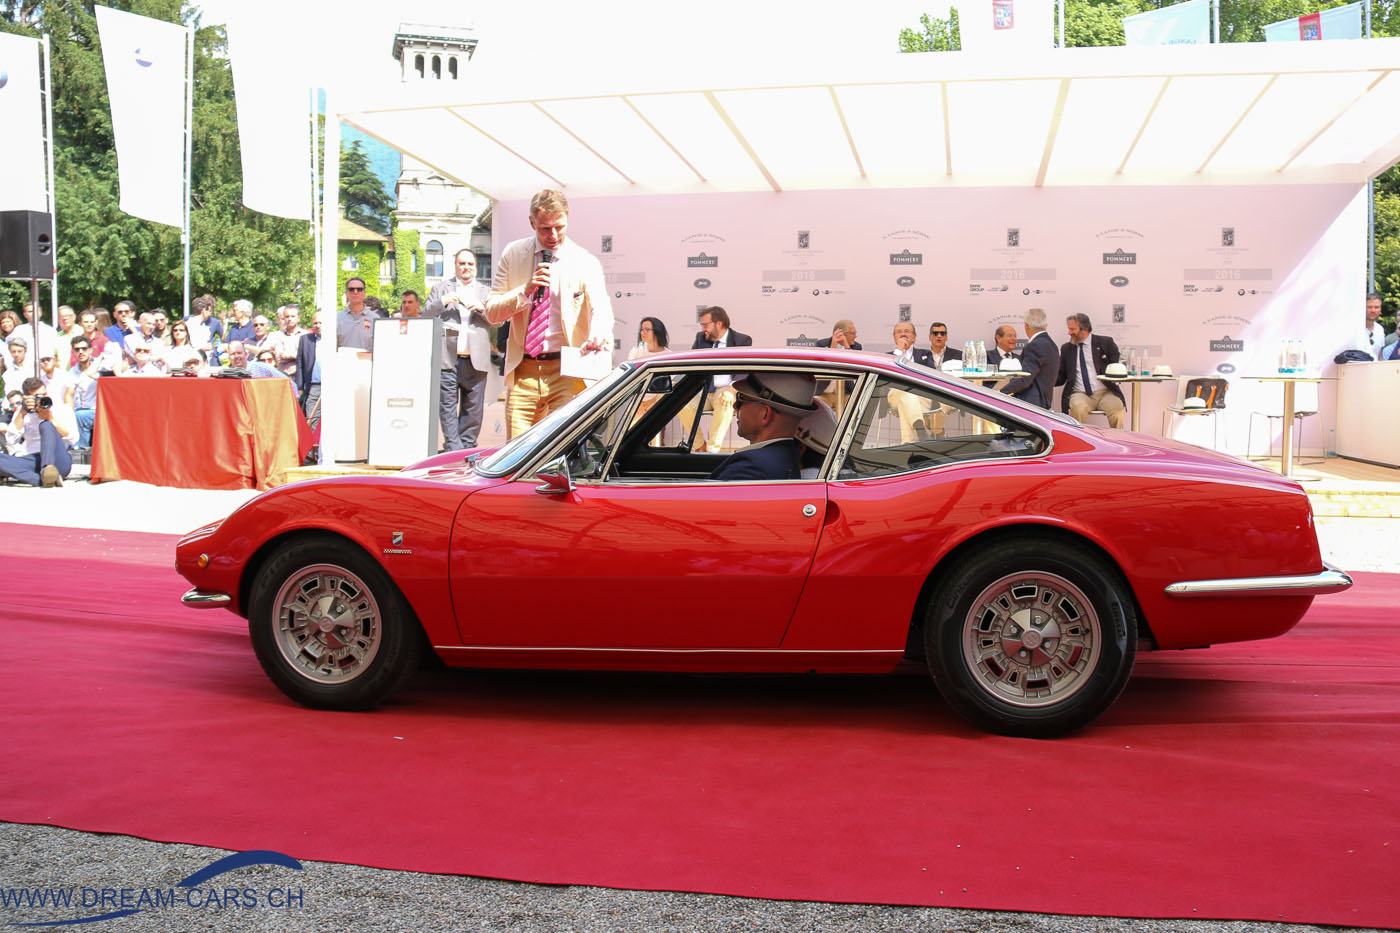 Concorso d'Eleganza Villa d'Este in der Villa Erba, 22.05.2016. Patrick Bischoff mit seinem Fiat Moretti 850